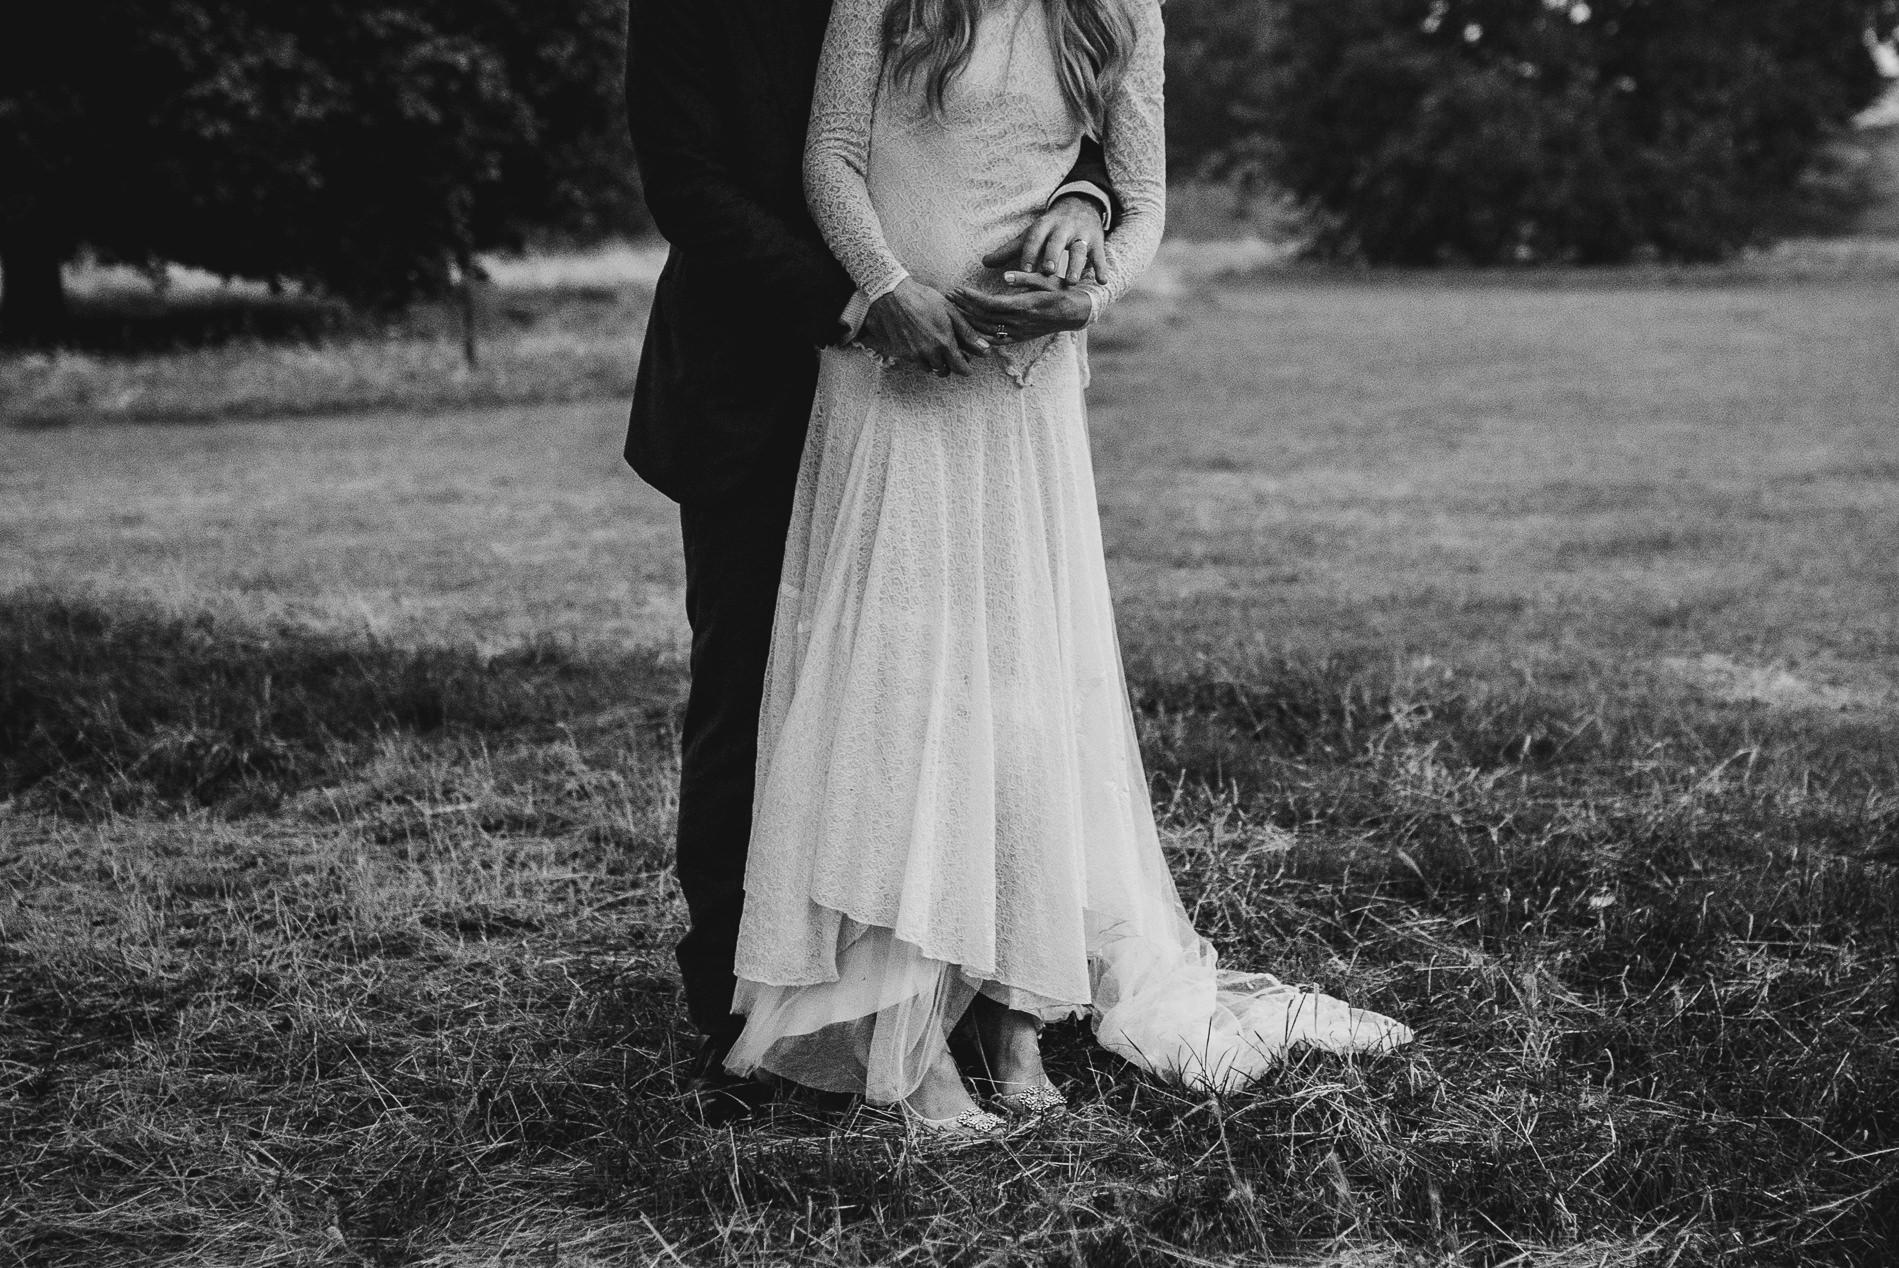 bohemian_wedding_lawshall_church_garden128